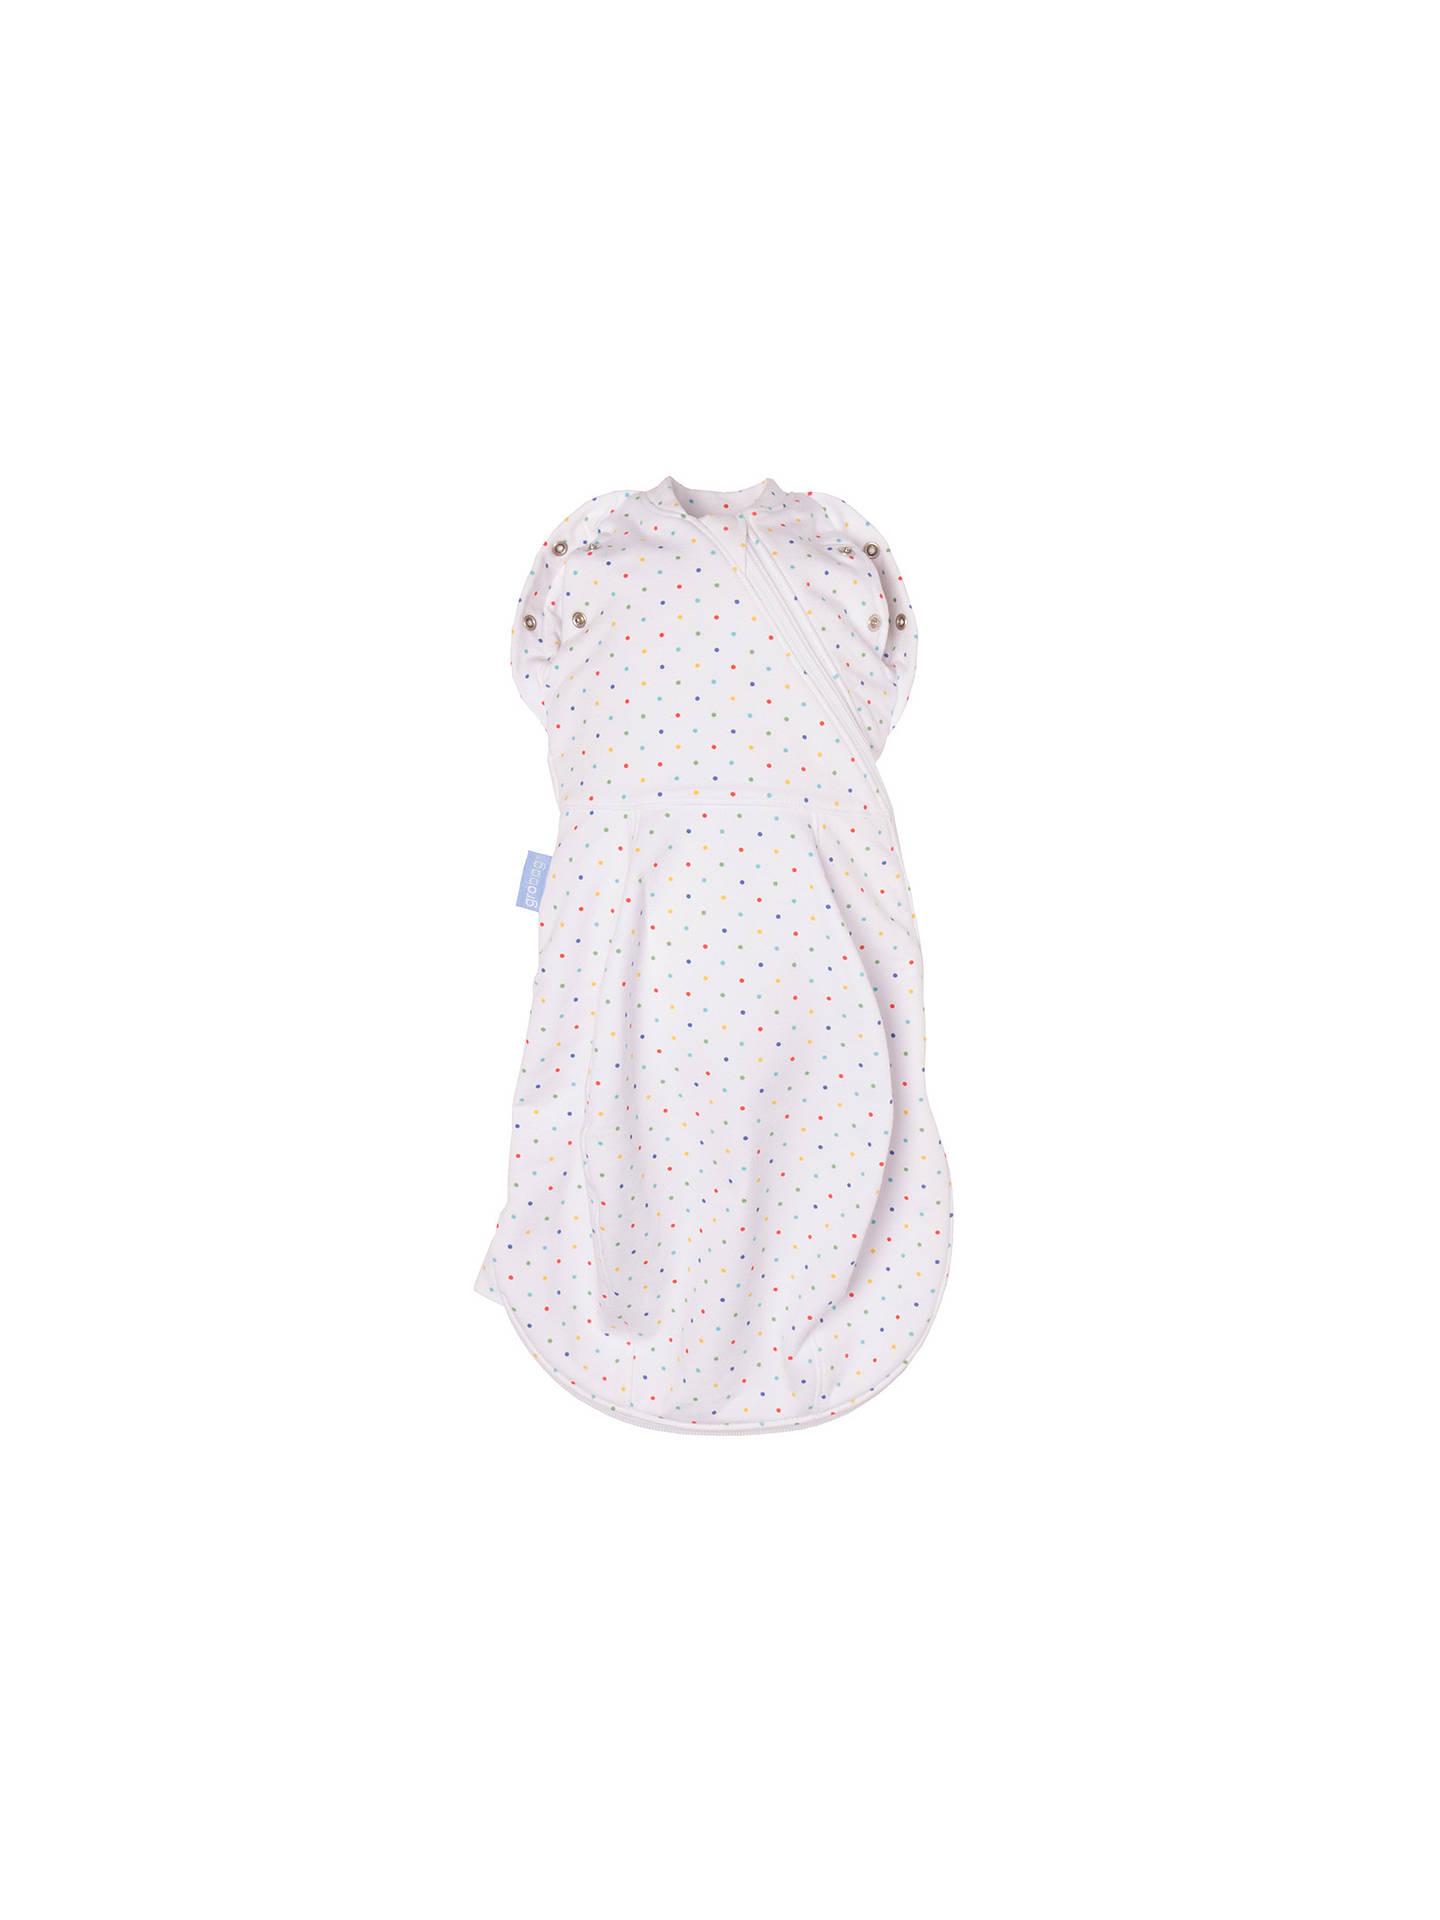 gro swaddle blanket instructions